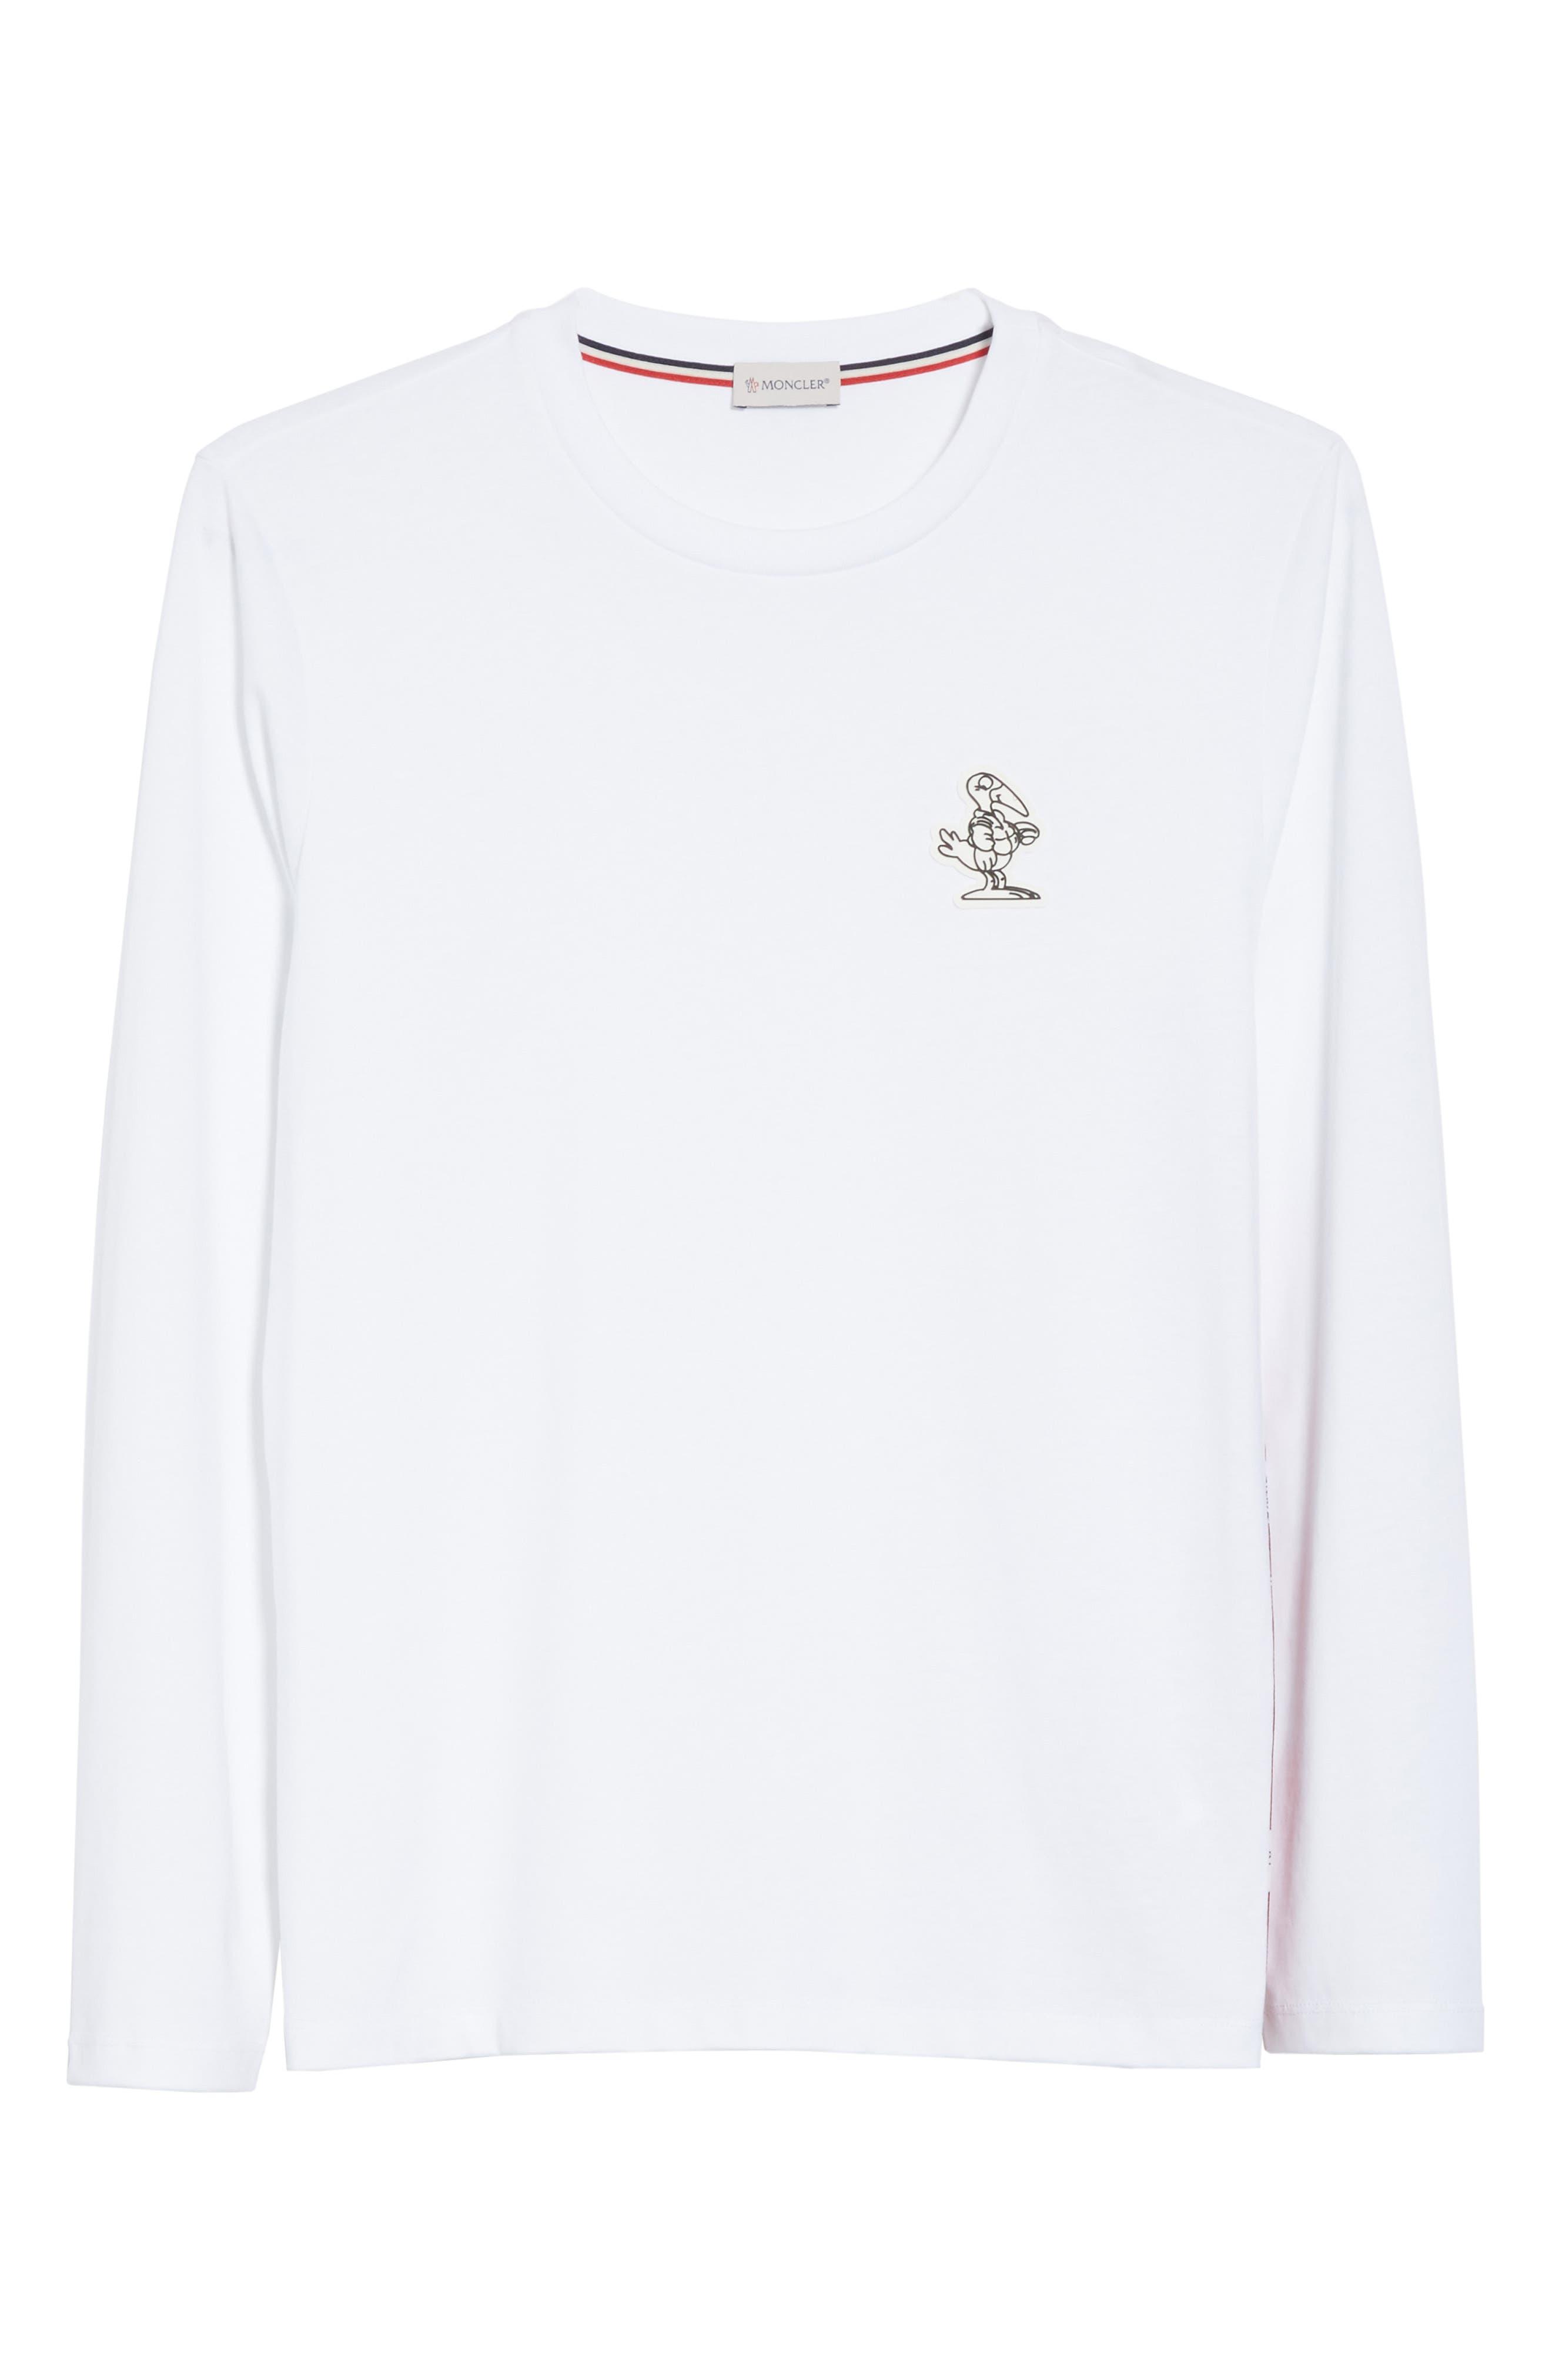 Maglia Griccollo Long Sleeve T-Shirt,                             Alternate thumbnail 6, color,                             100